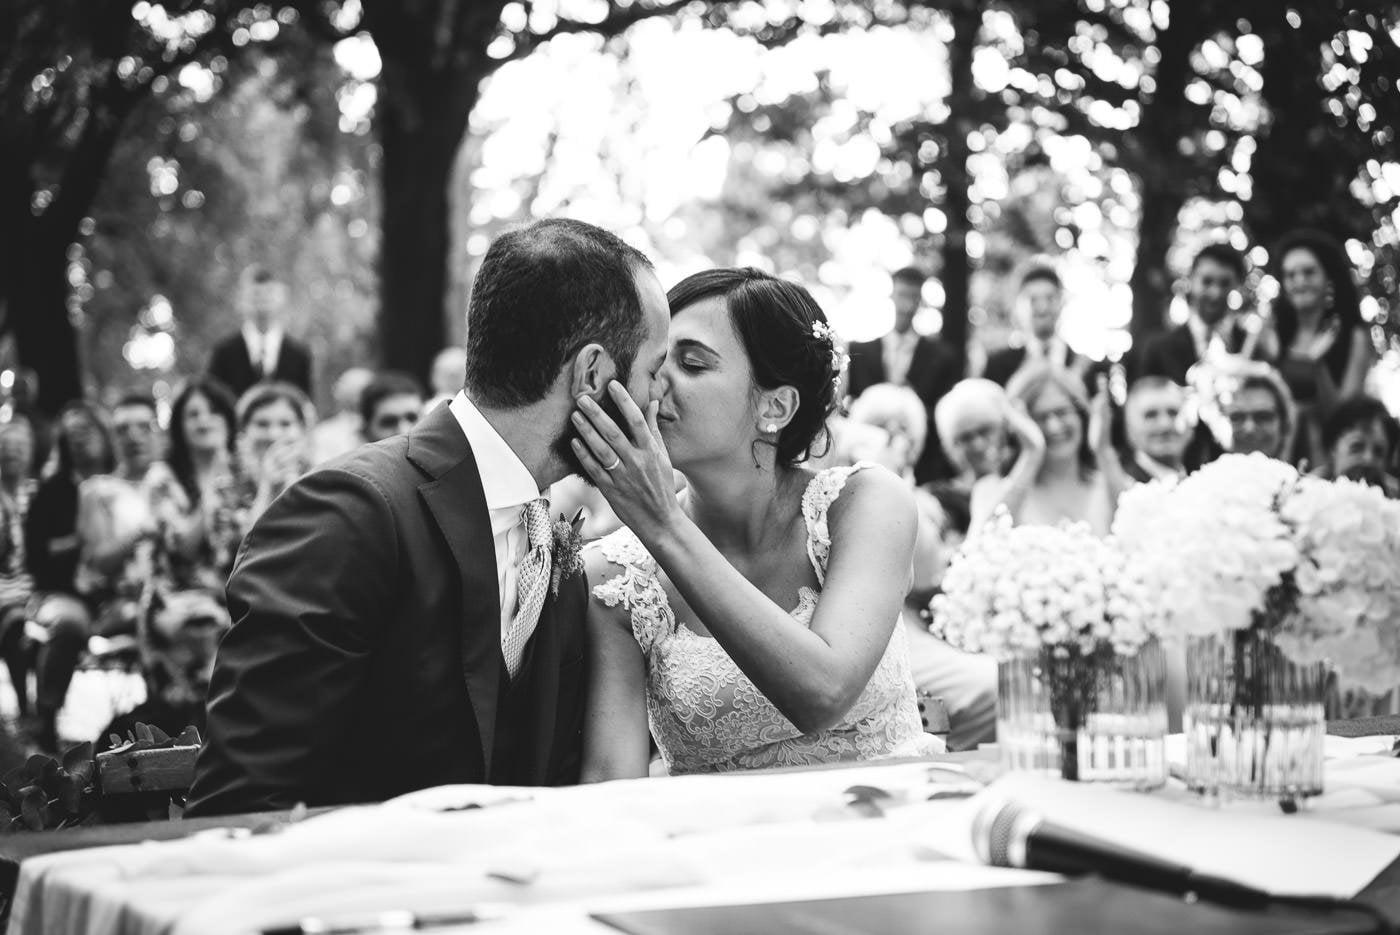 Matrimonio Giulia & Federico 09_15 – Alessio Nobili Photographer-34